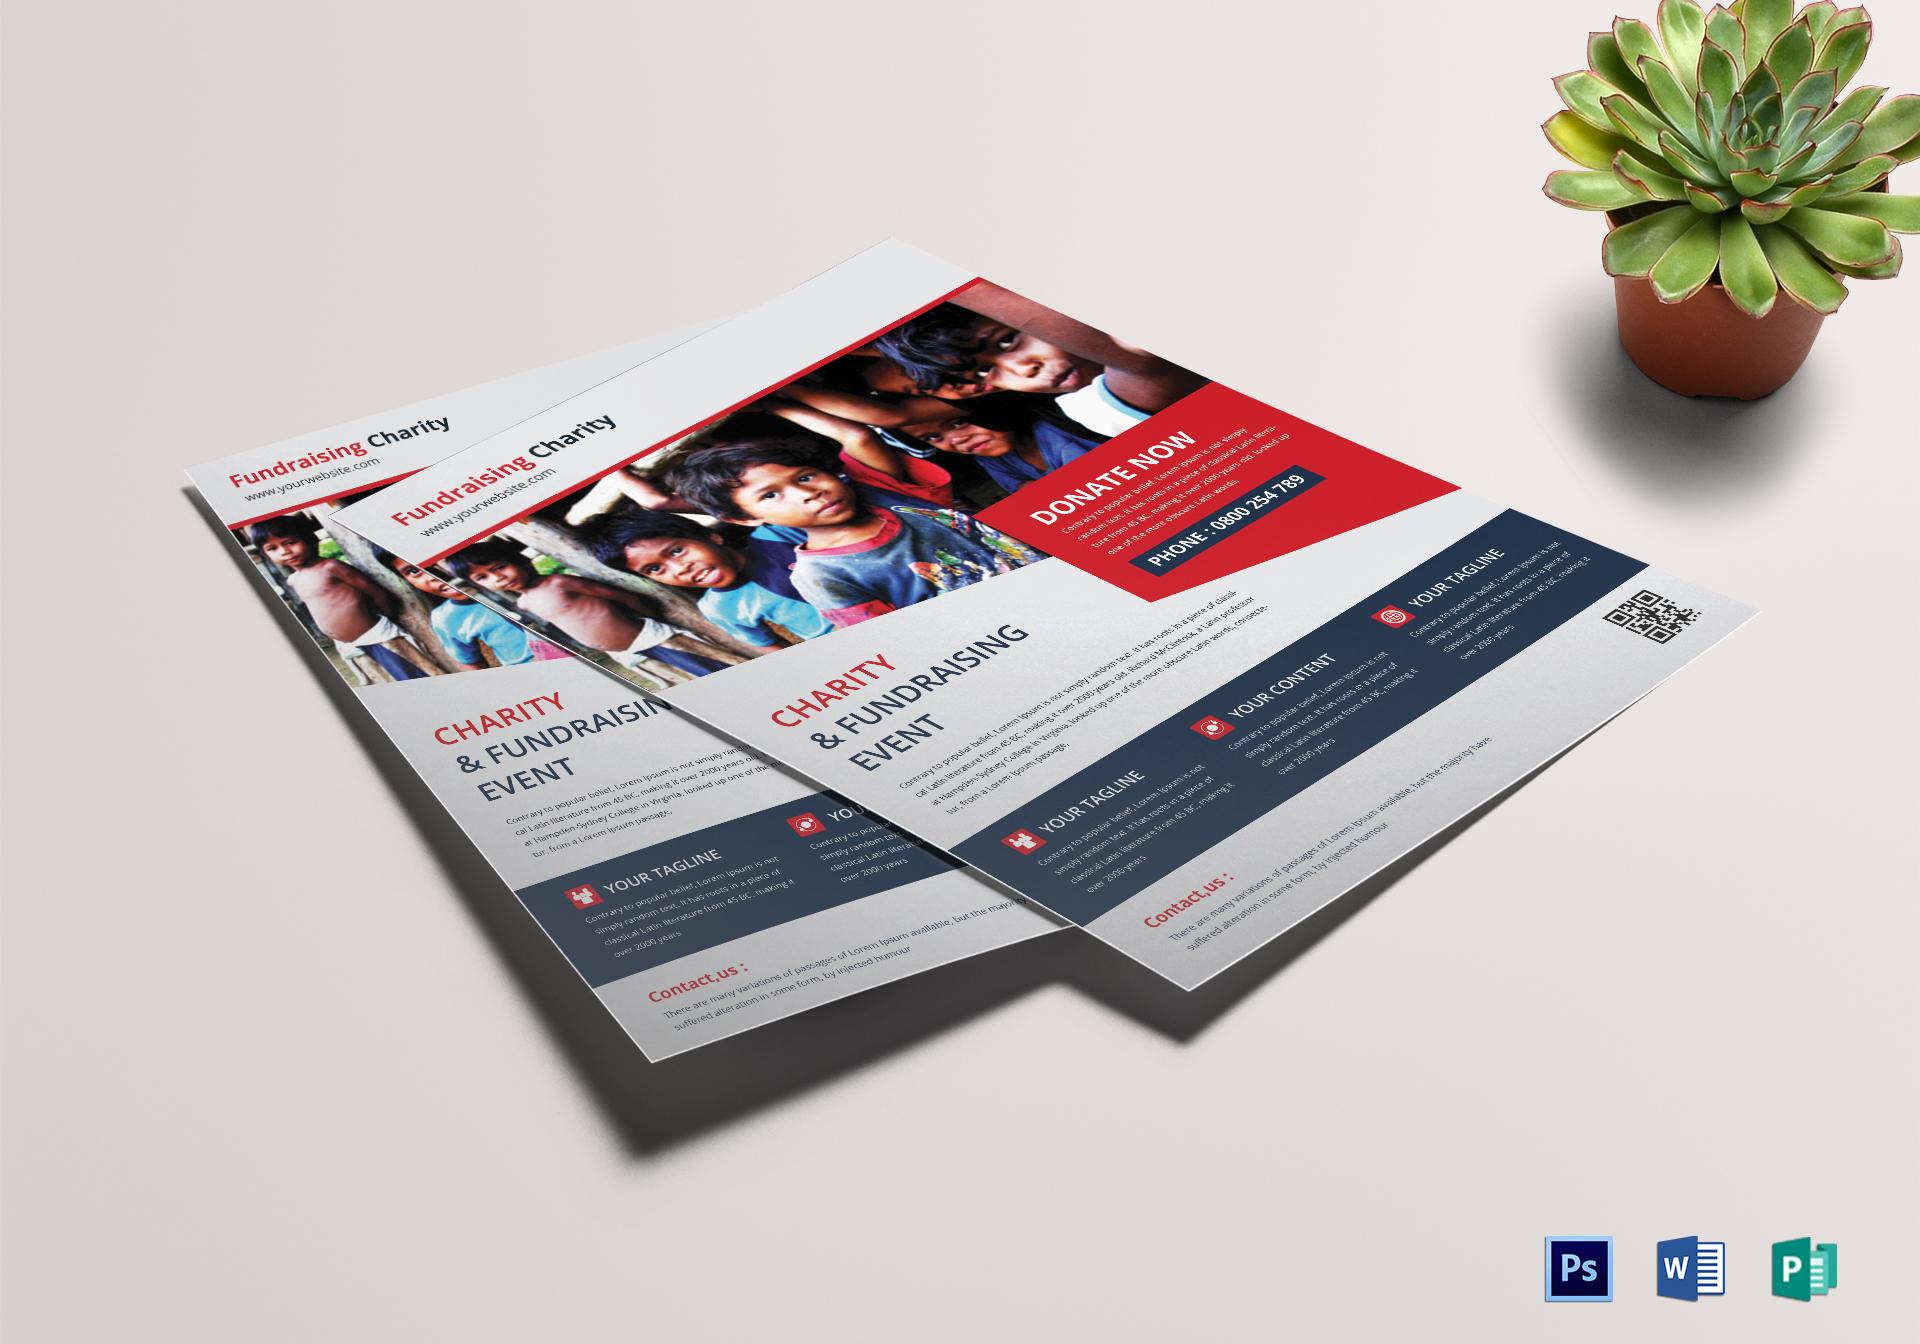 juvenile church fundraiser flyer design template in psd word